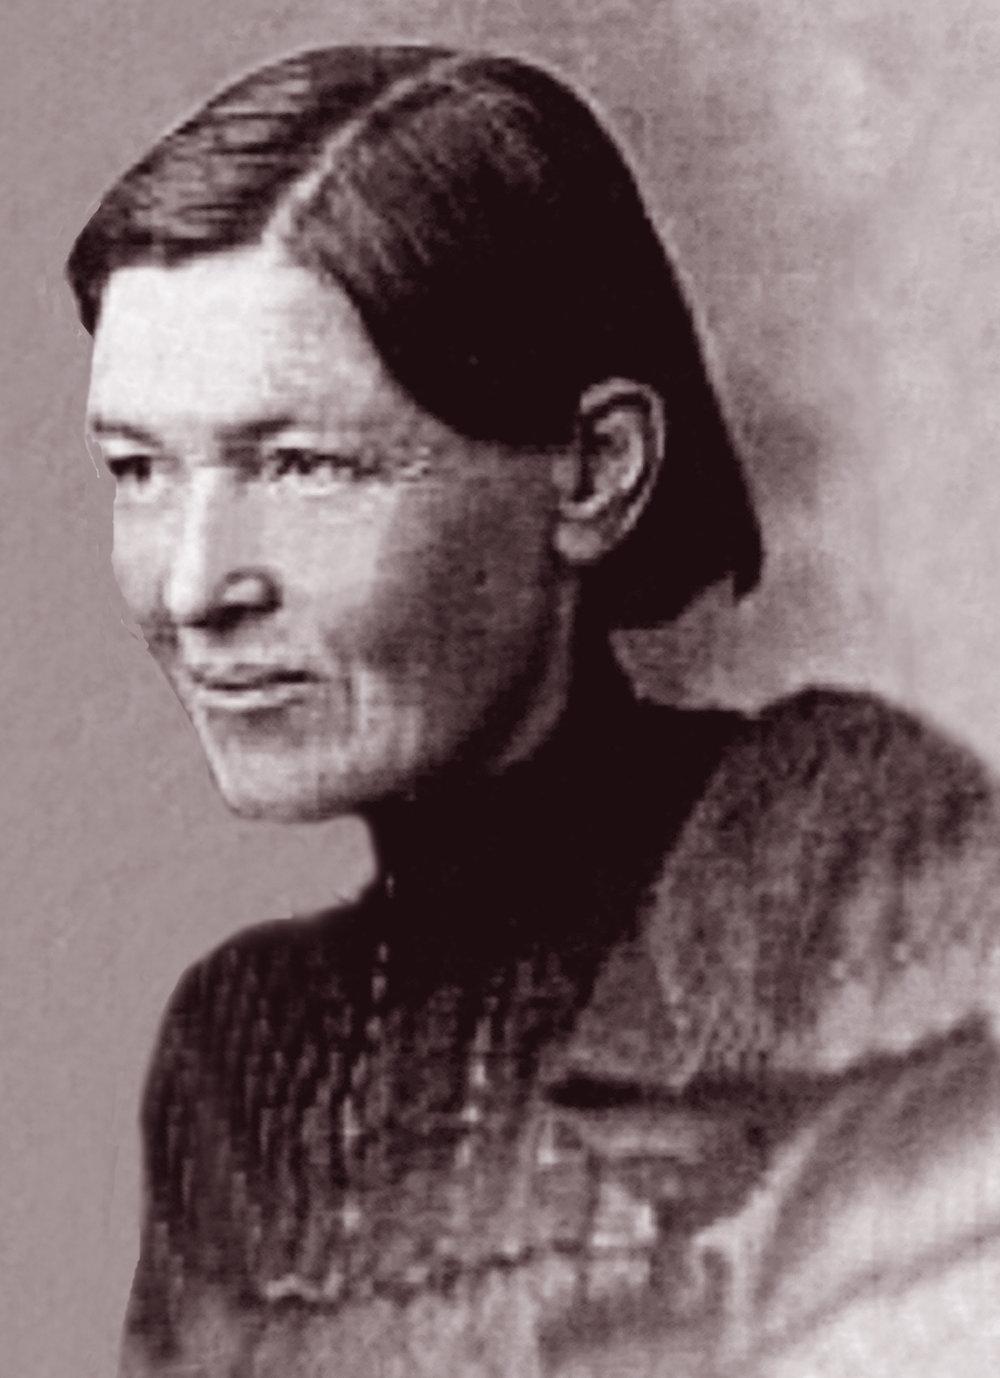 Copy of Mary Slessor (1848-1915)